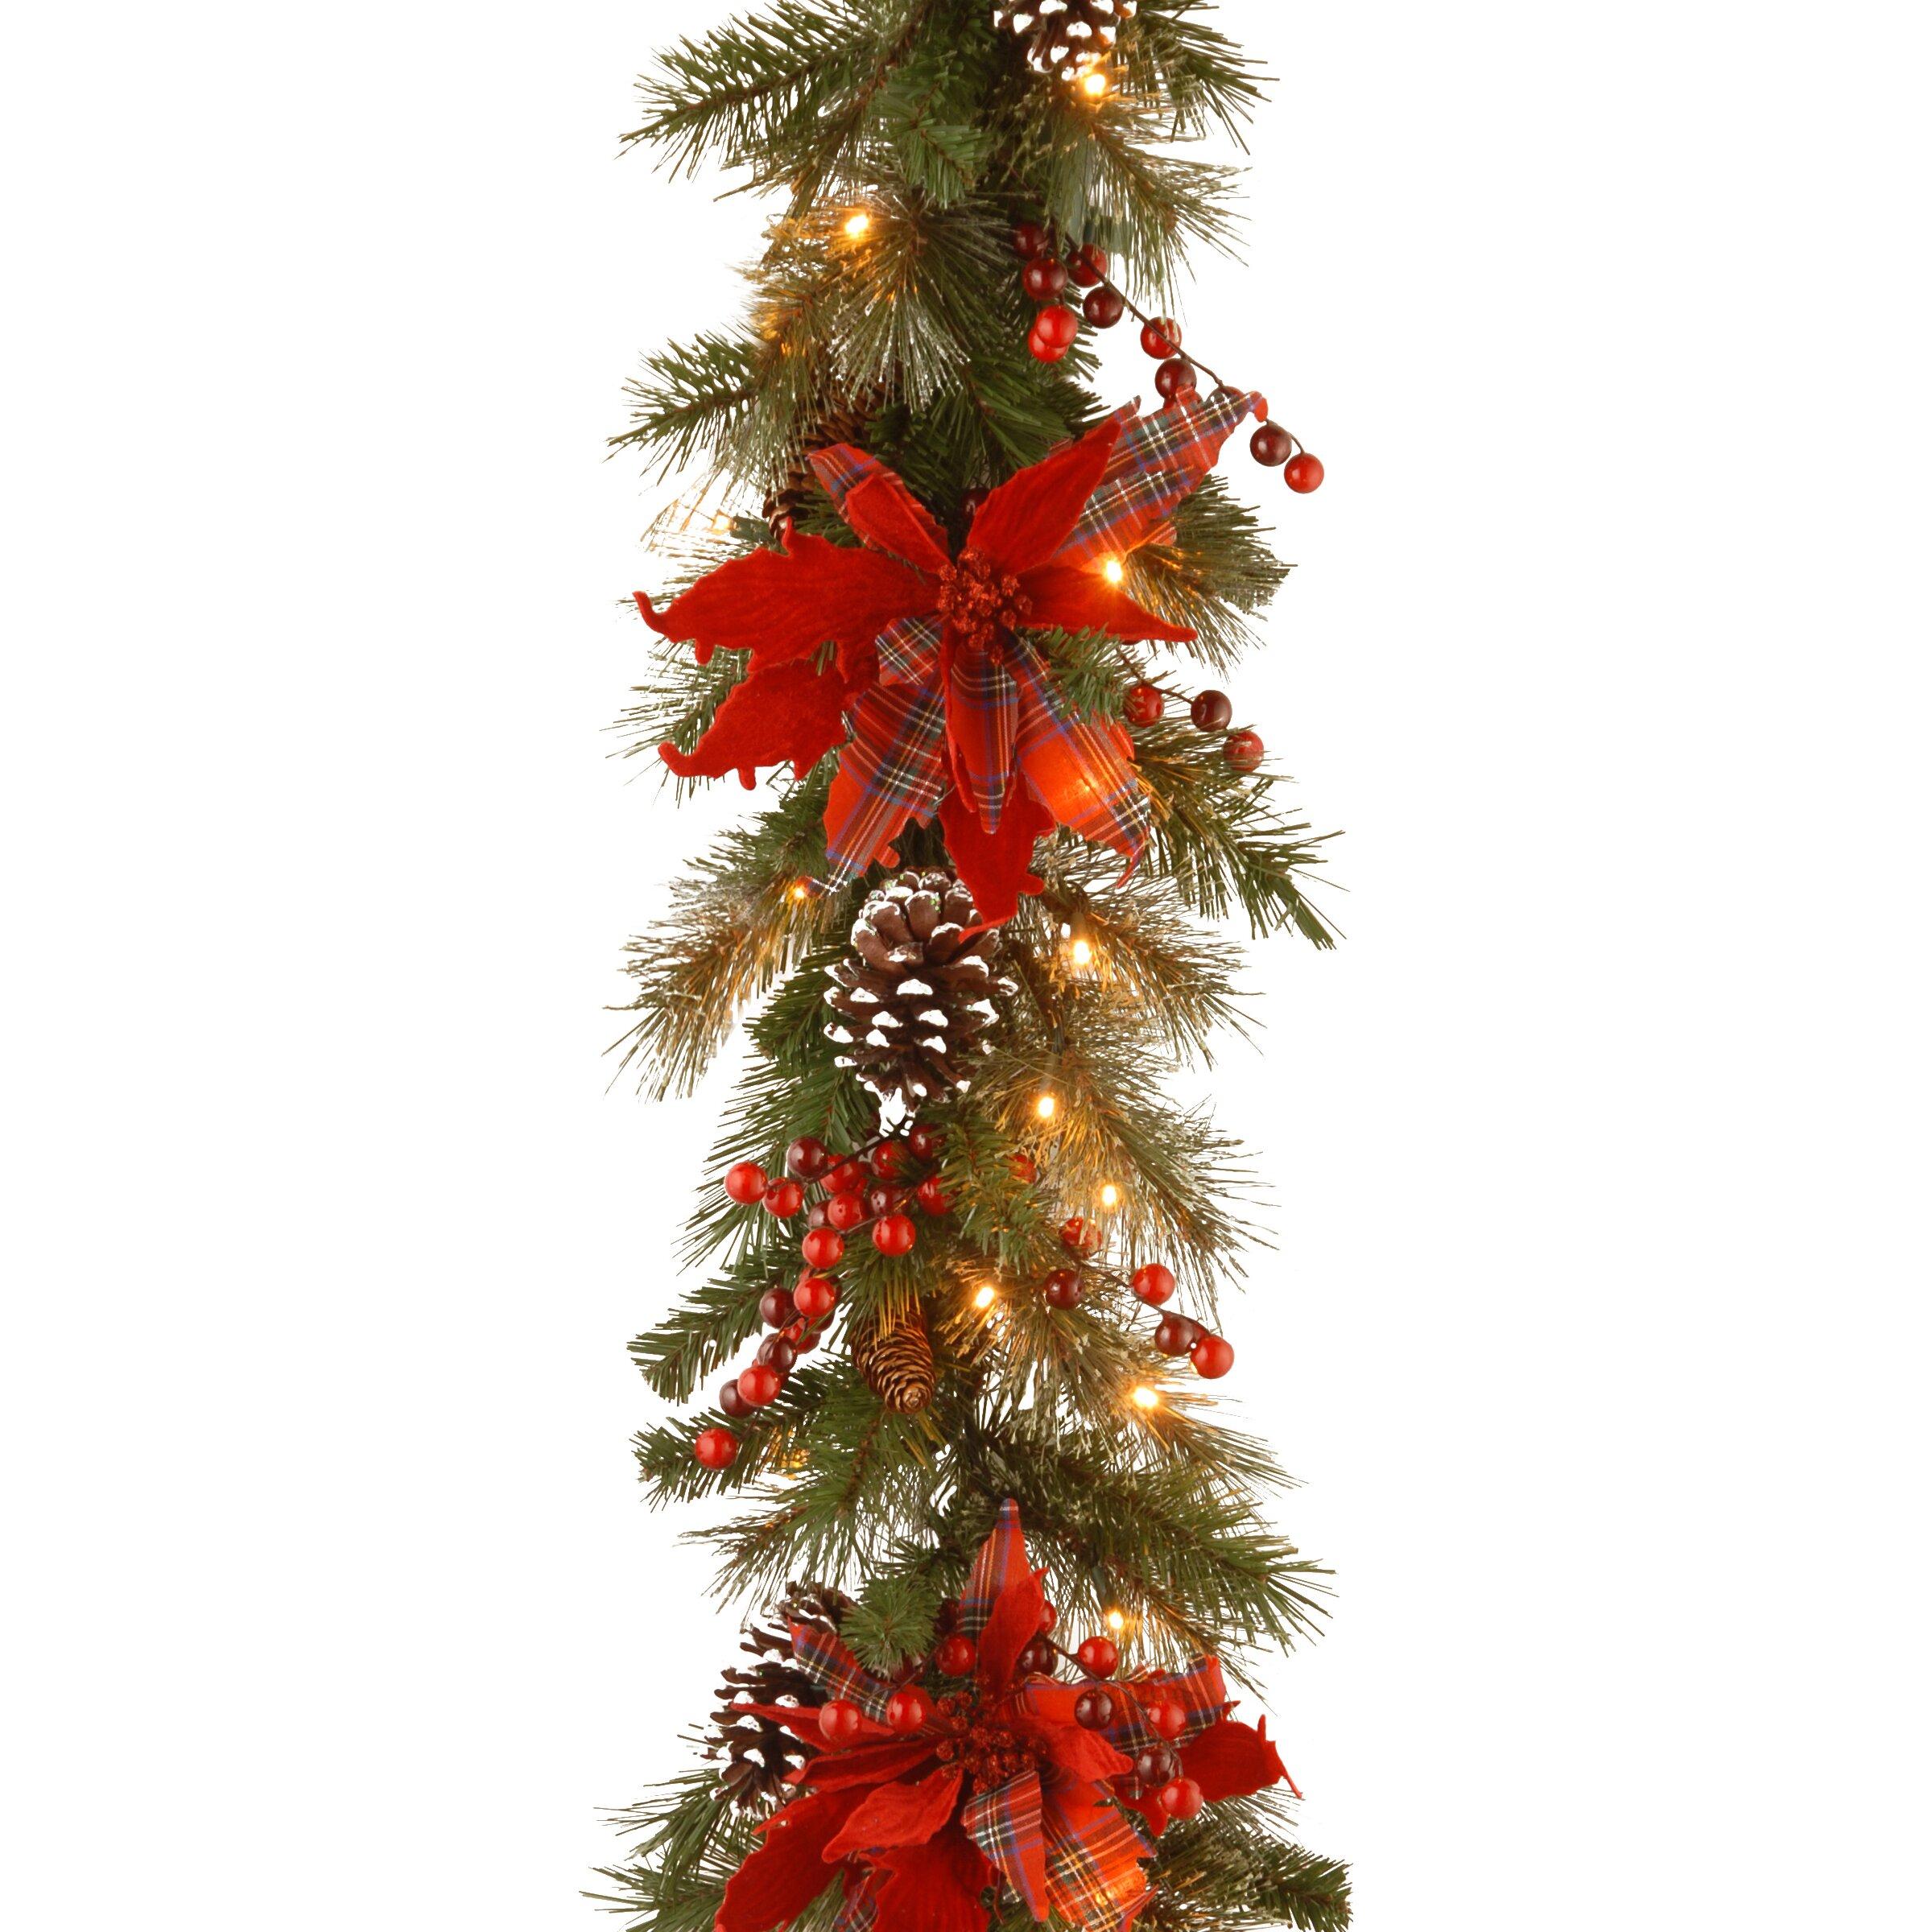 national tree co decorative pre lit tartan plaid garland reviews wayfair. Black Bedroom Furniture Sets. Home Design Ideas